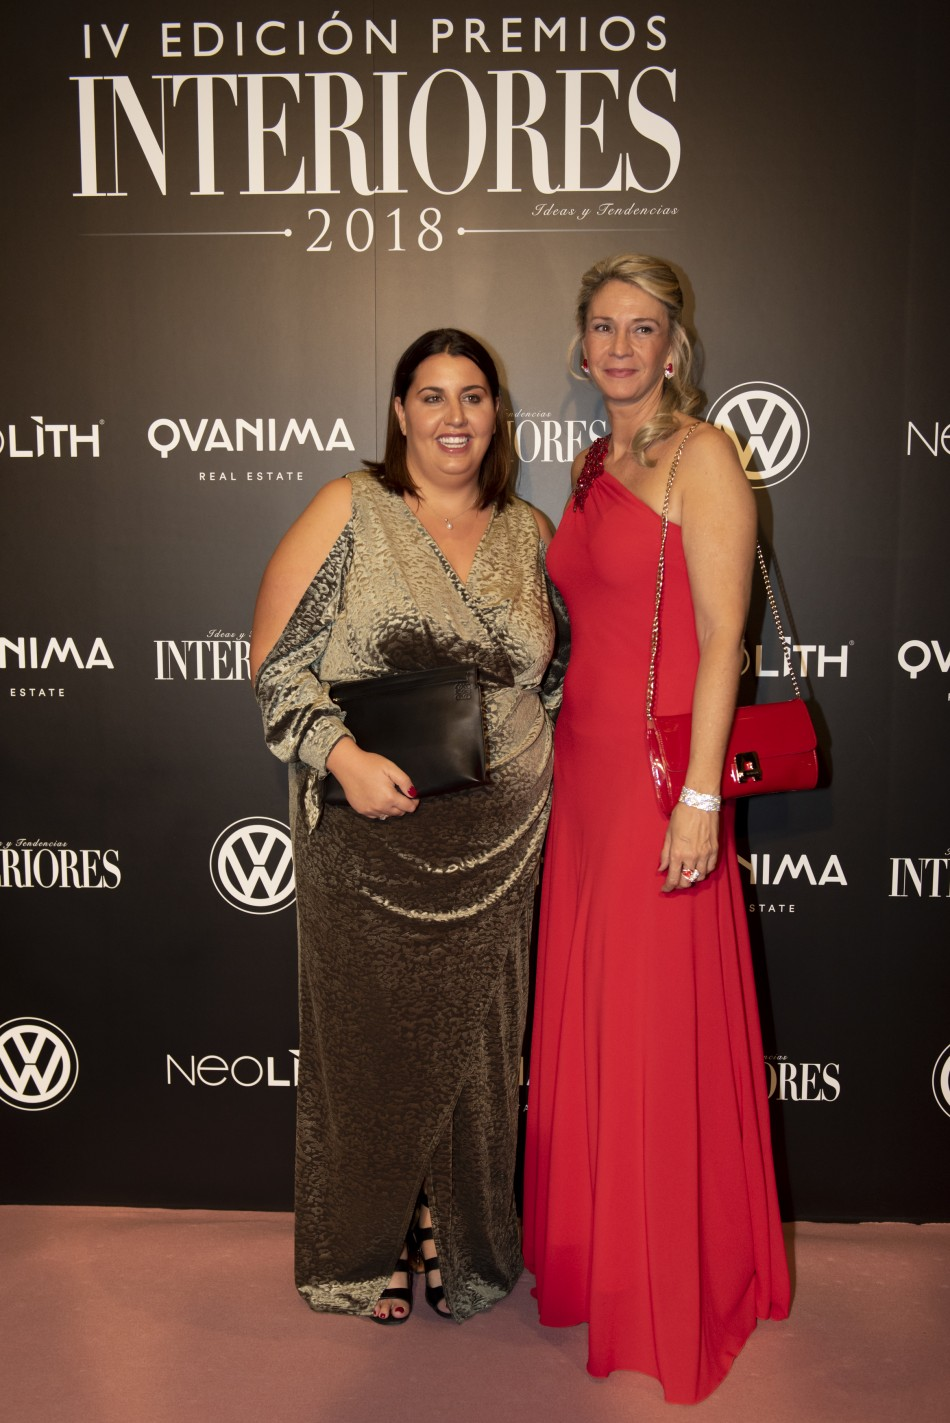 IV-Premios-Interioires-2018-Photocall-LuxurySpain